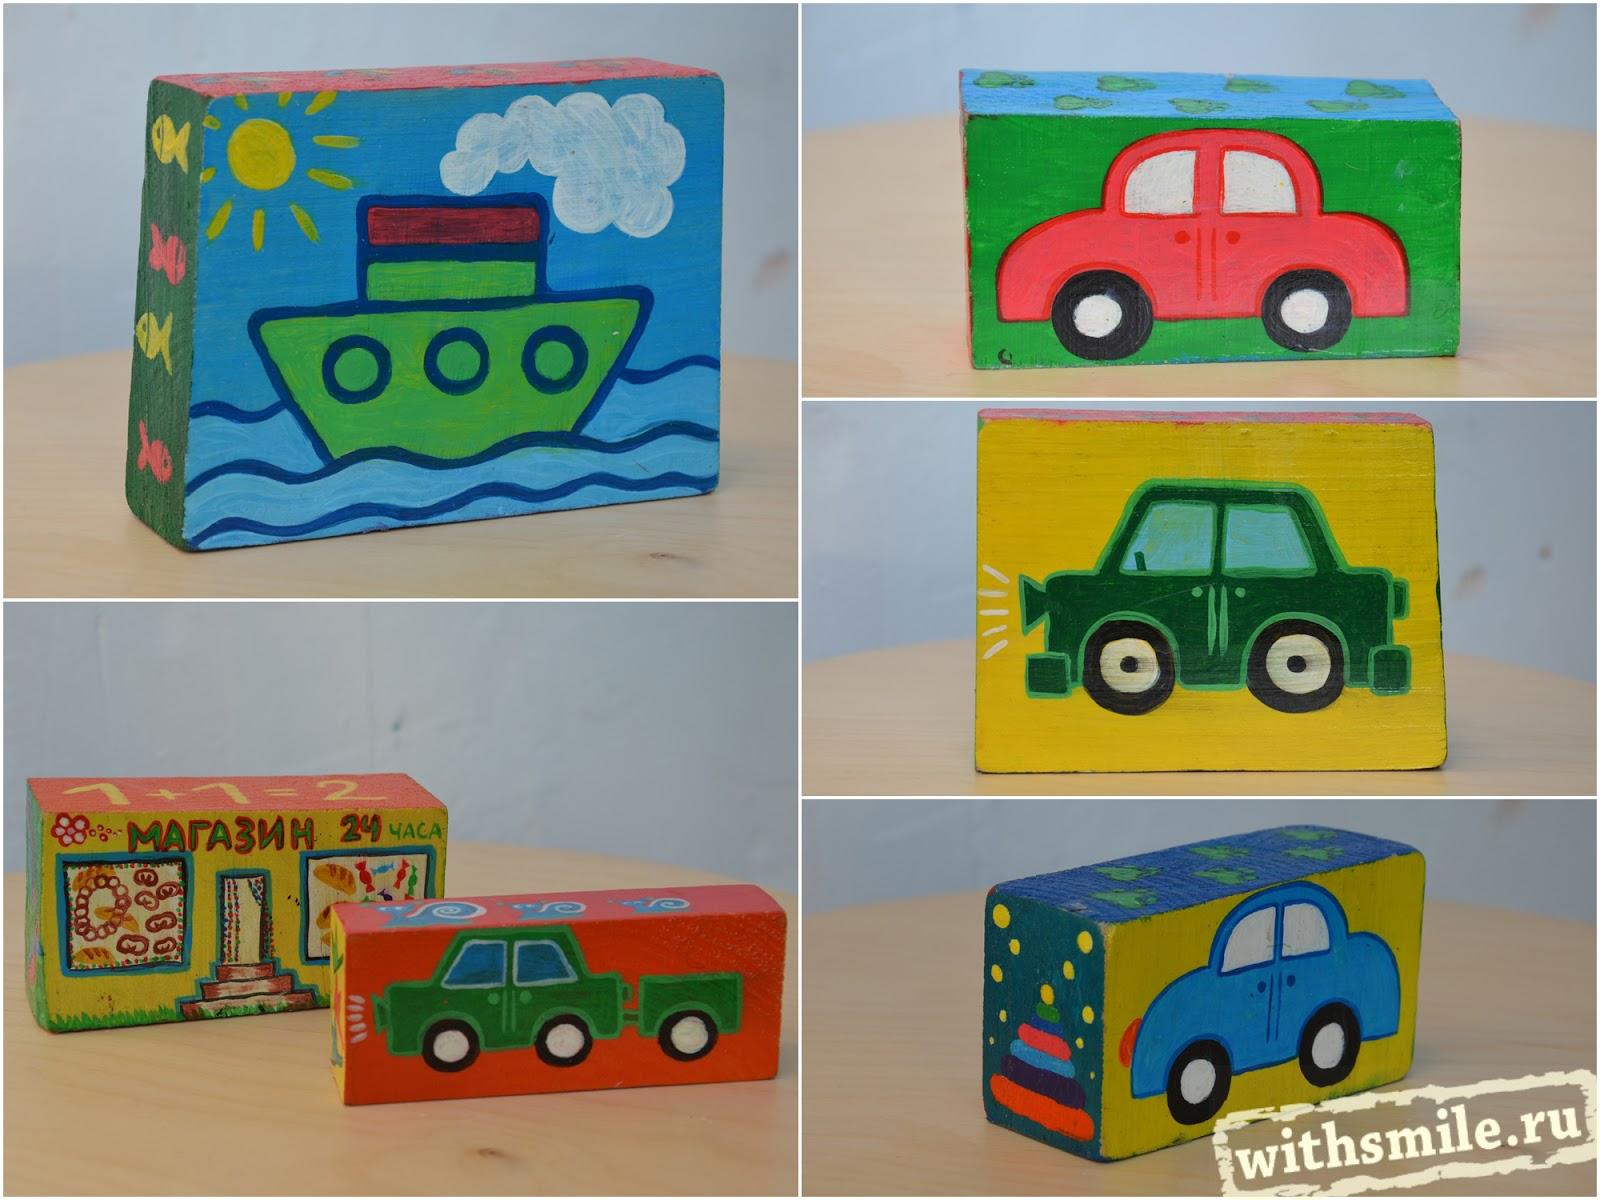 транспорт, из дерева, игрушки своими руками, развивающие игрушки